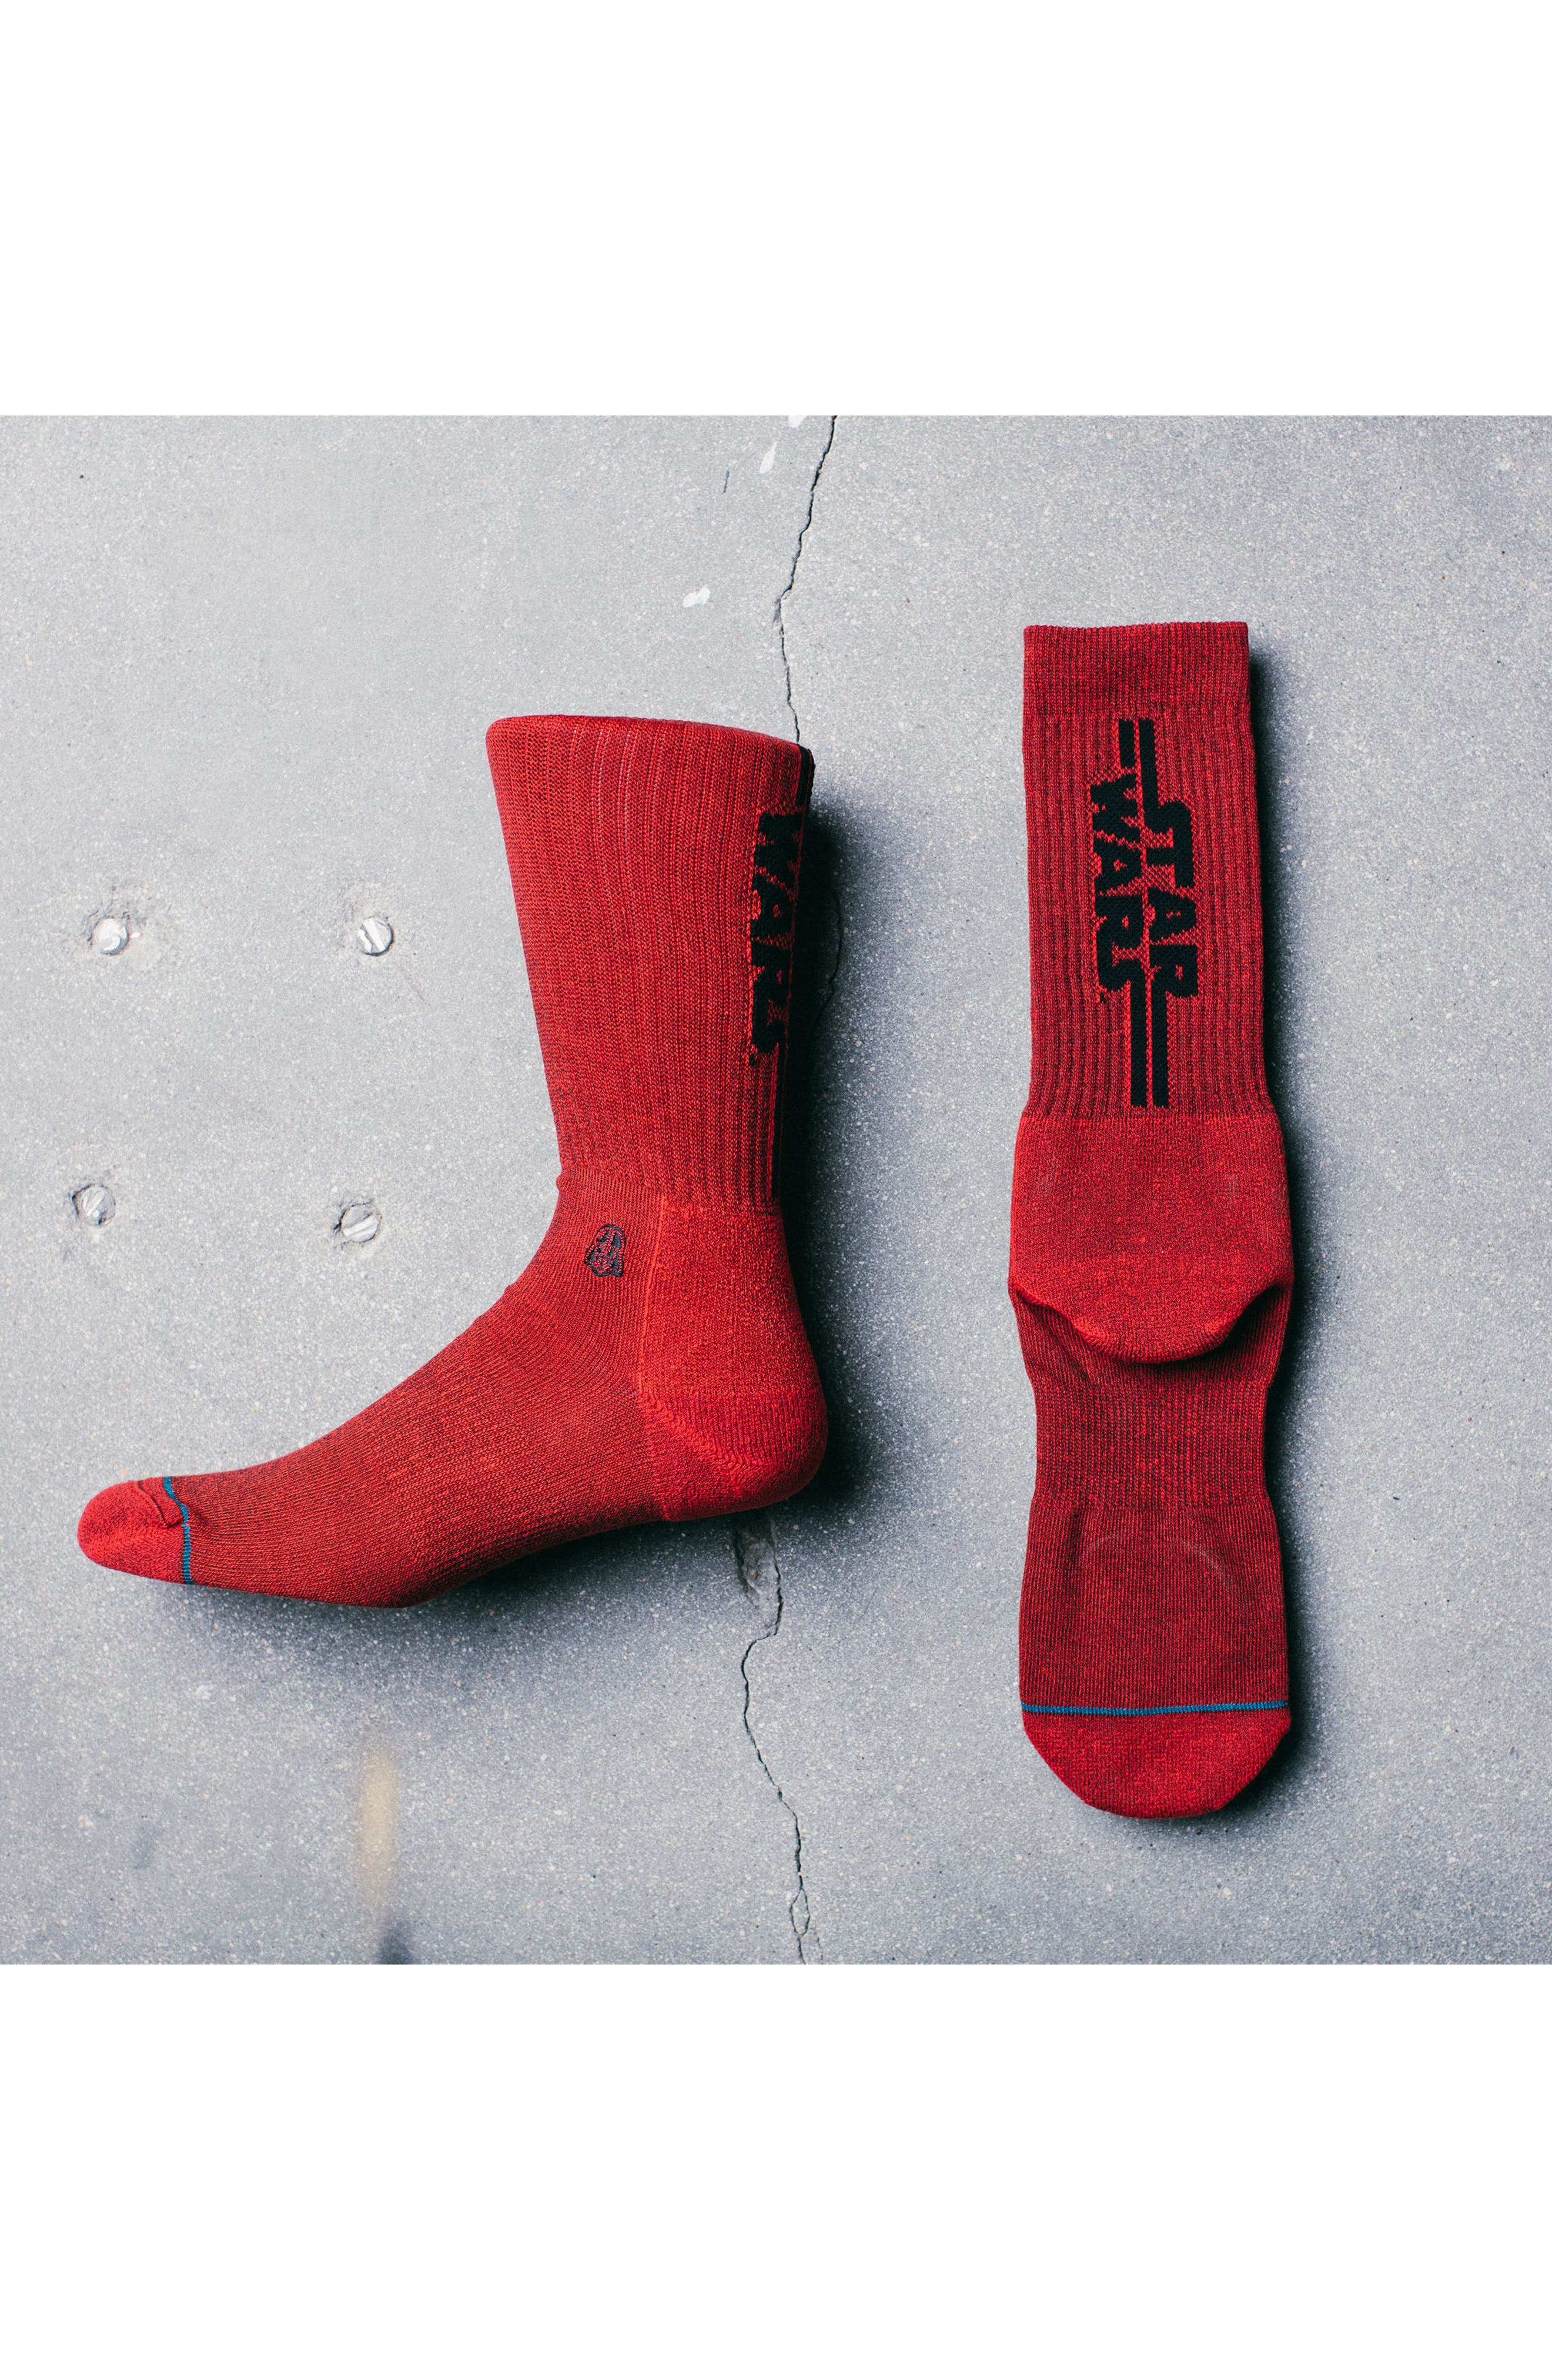 Star Wars Solid Vader Socks,                             Alternate thumbnail 2, color,                             Red